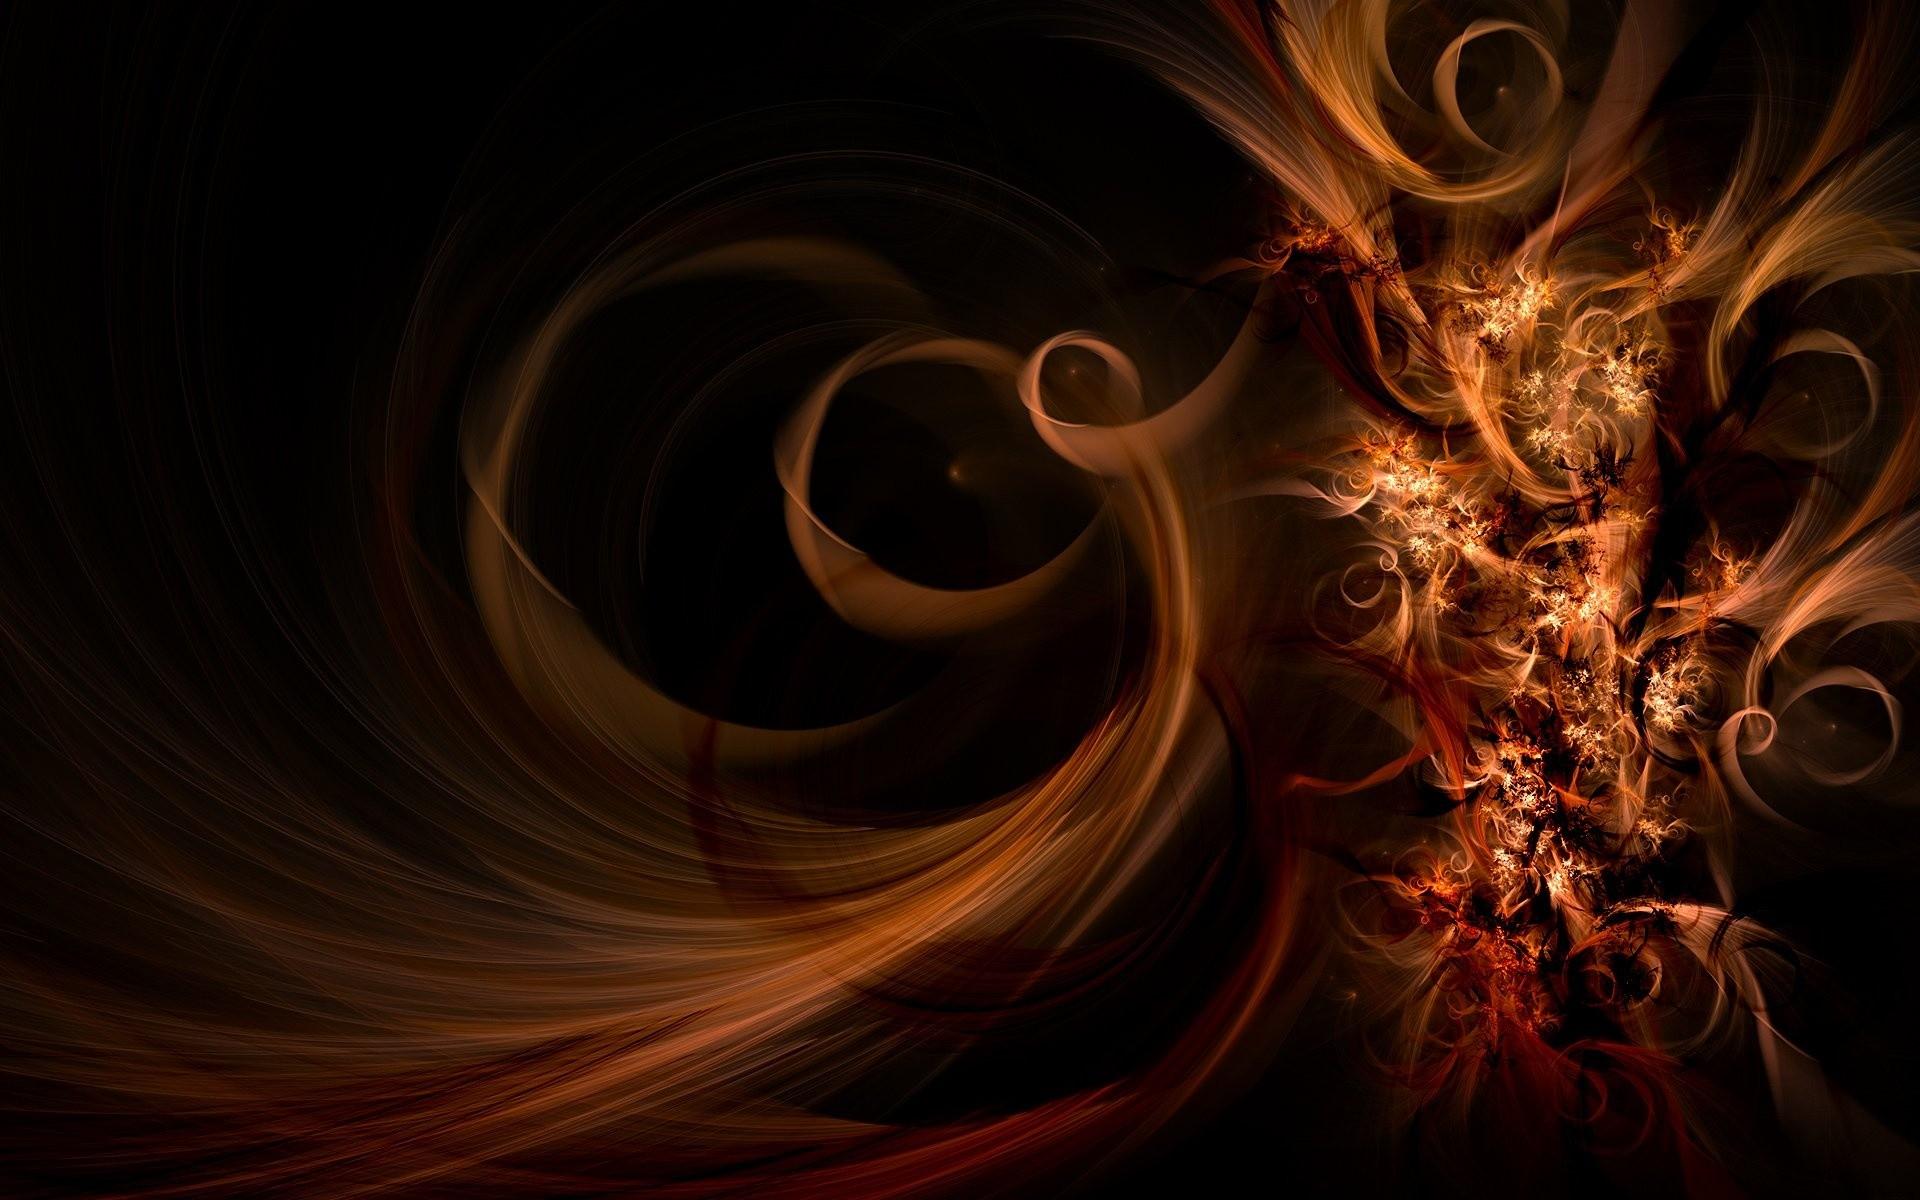 Orange Abstract With Fantasy Light 363254 Wallpaper Wallpaper